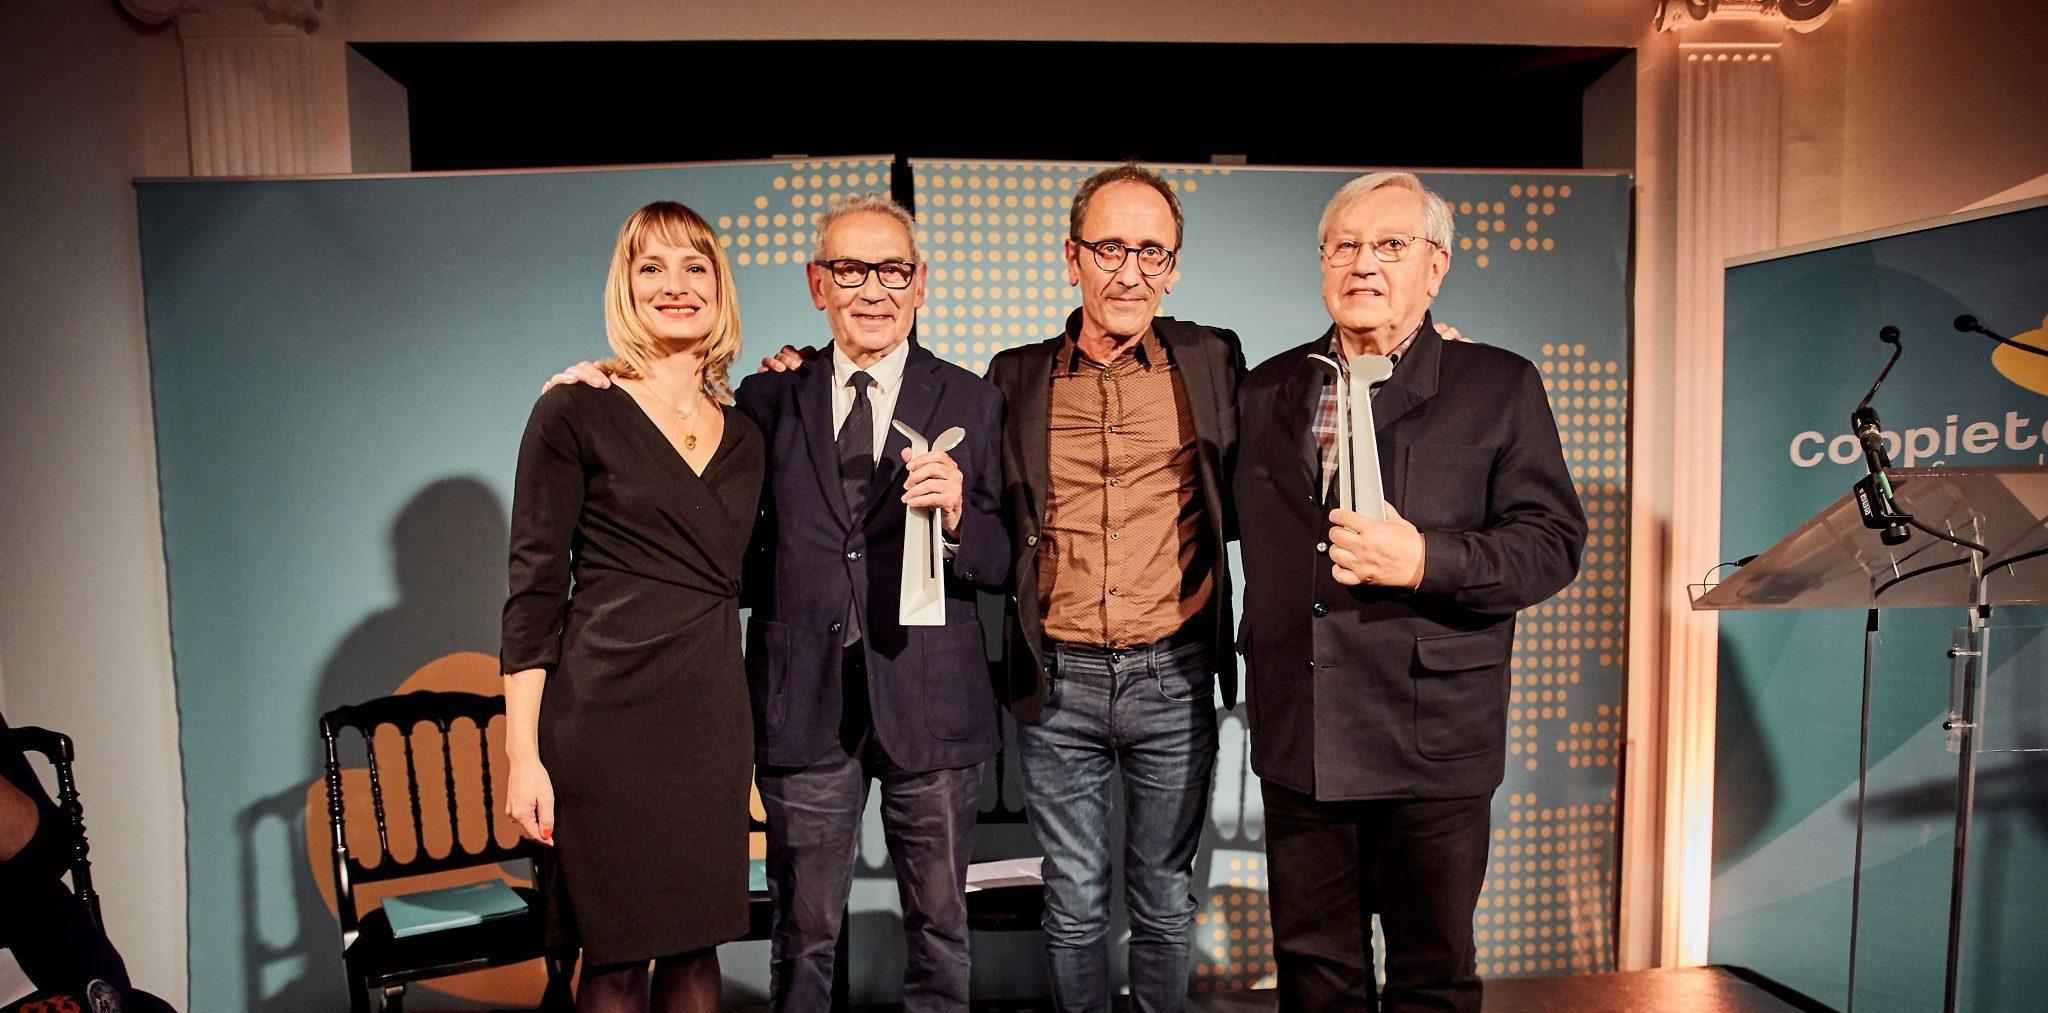 Camilo Nogueira and Patxi Zabaleta receive 2019 Coppieters Awards